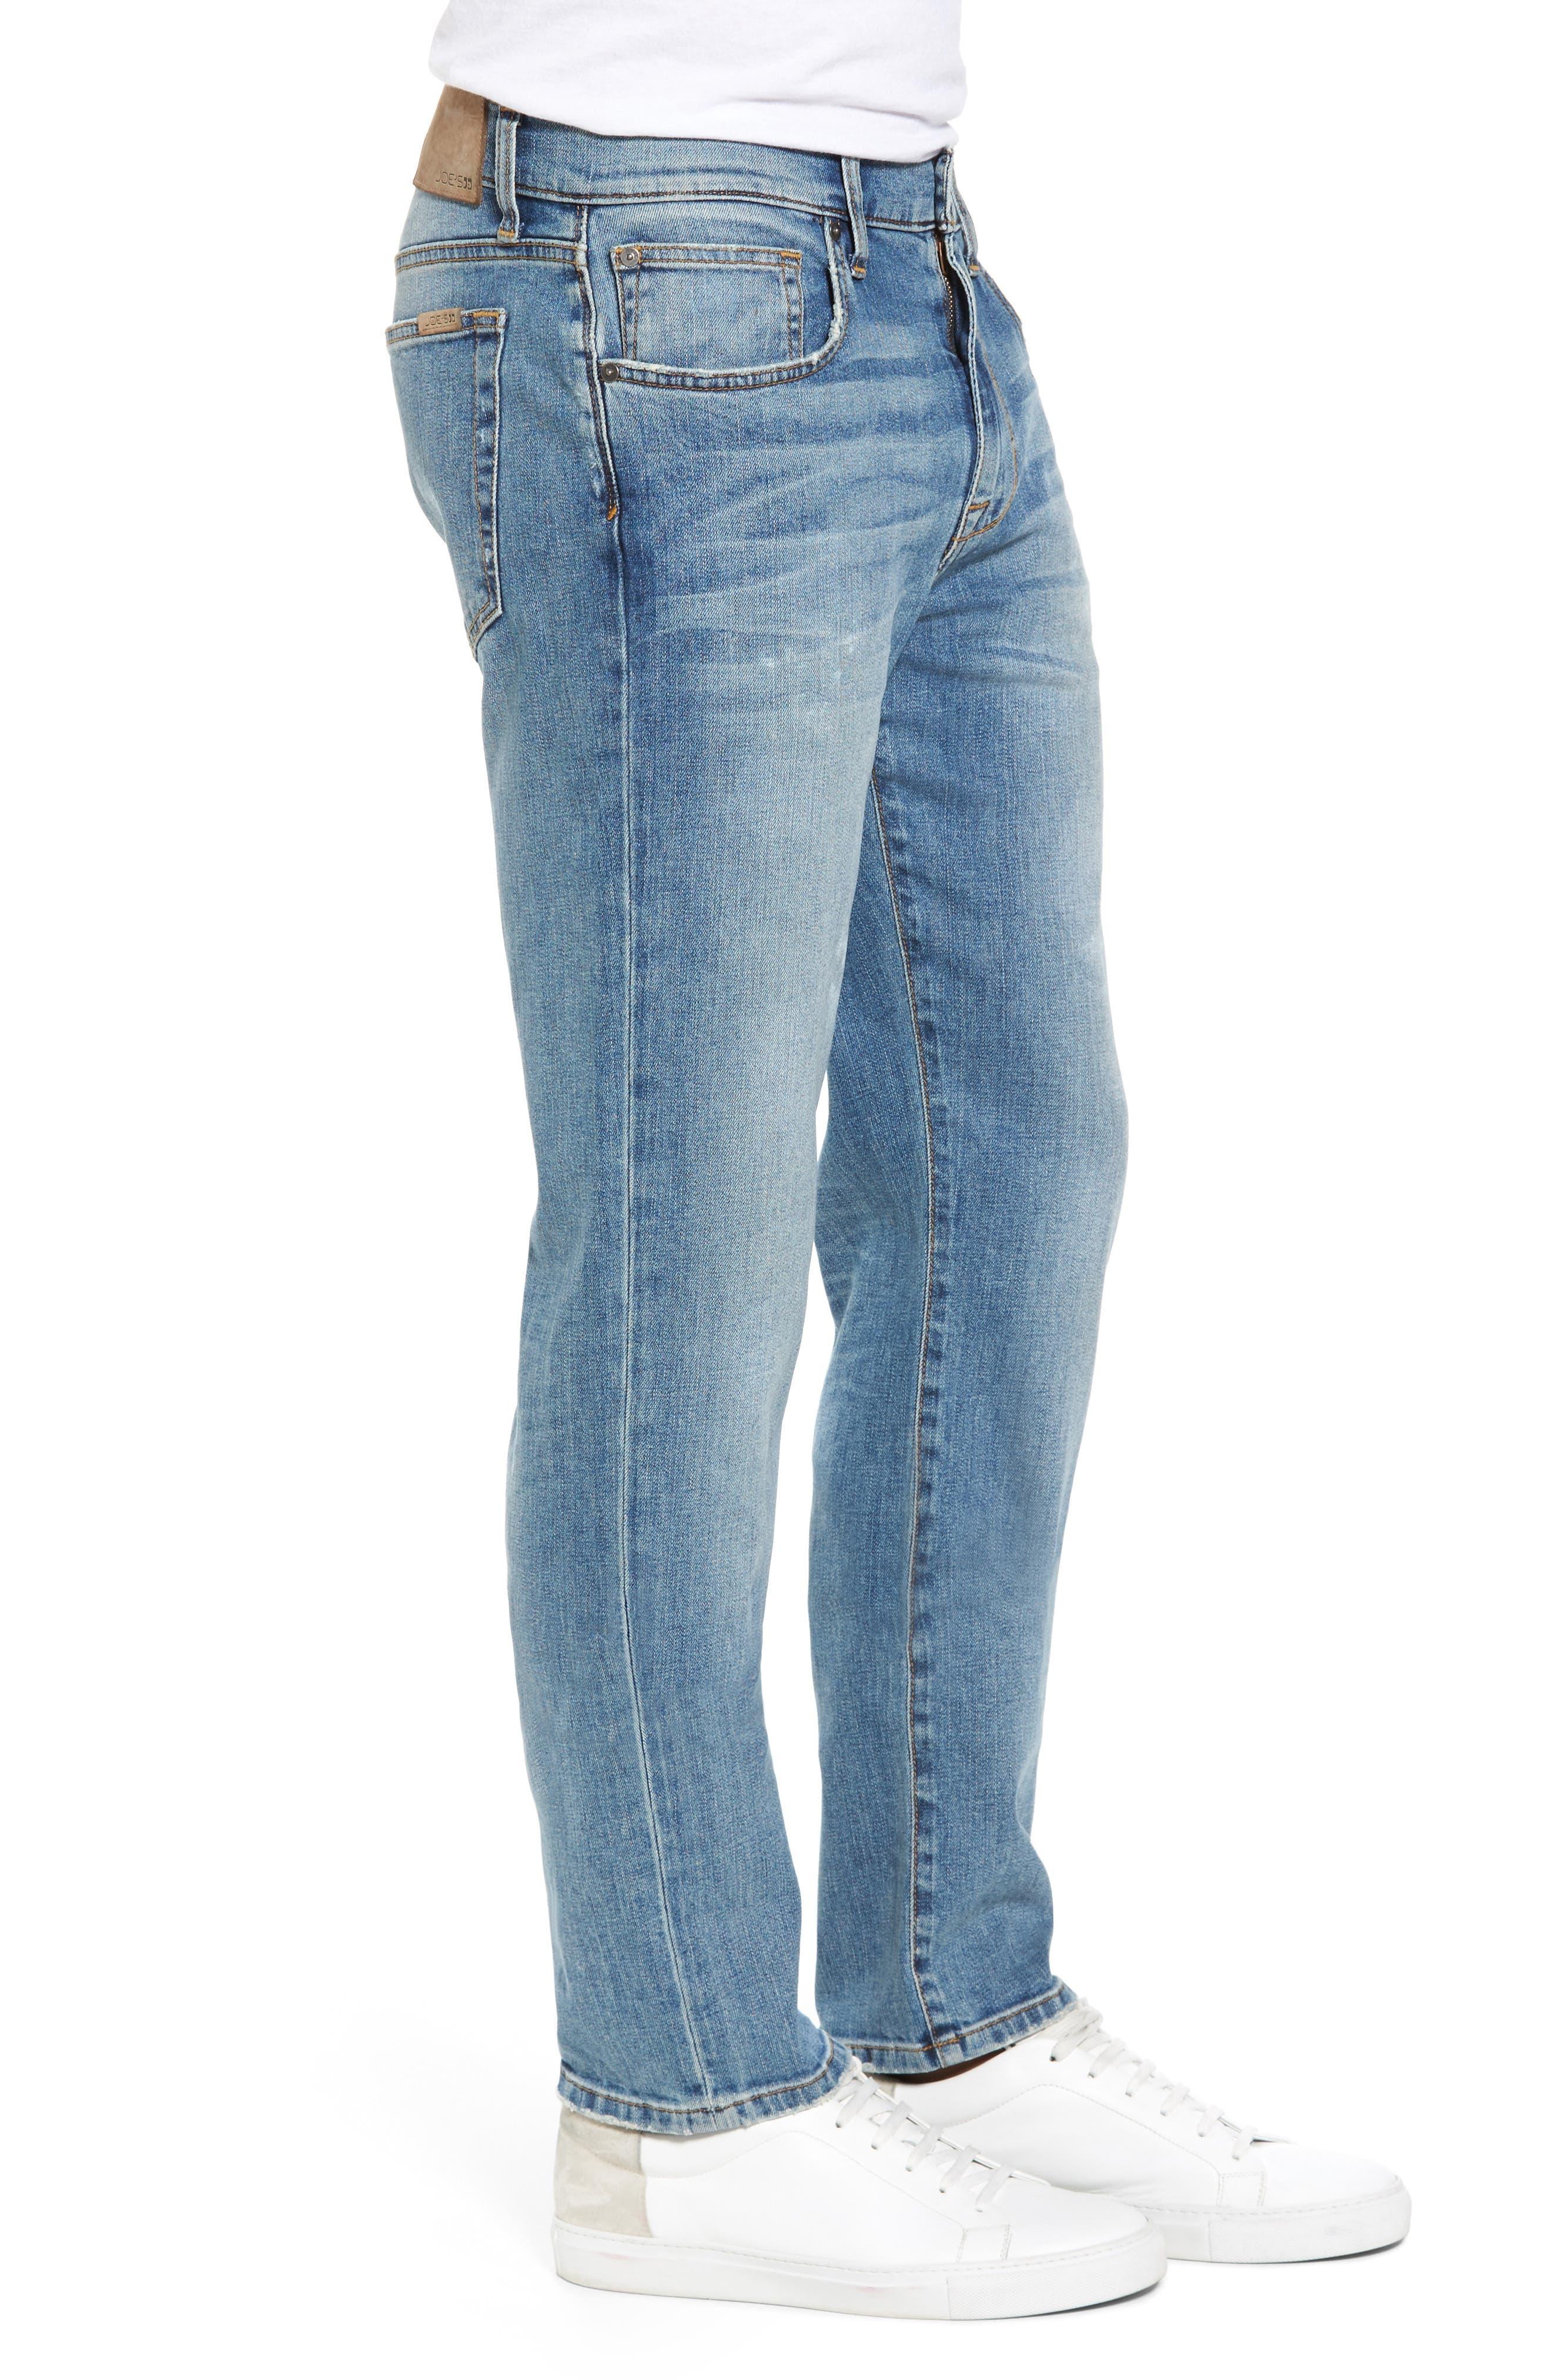 Brixton Slim Straight Fit Jeans,                             Alternate thumbnail 3, color,                             Wyman